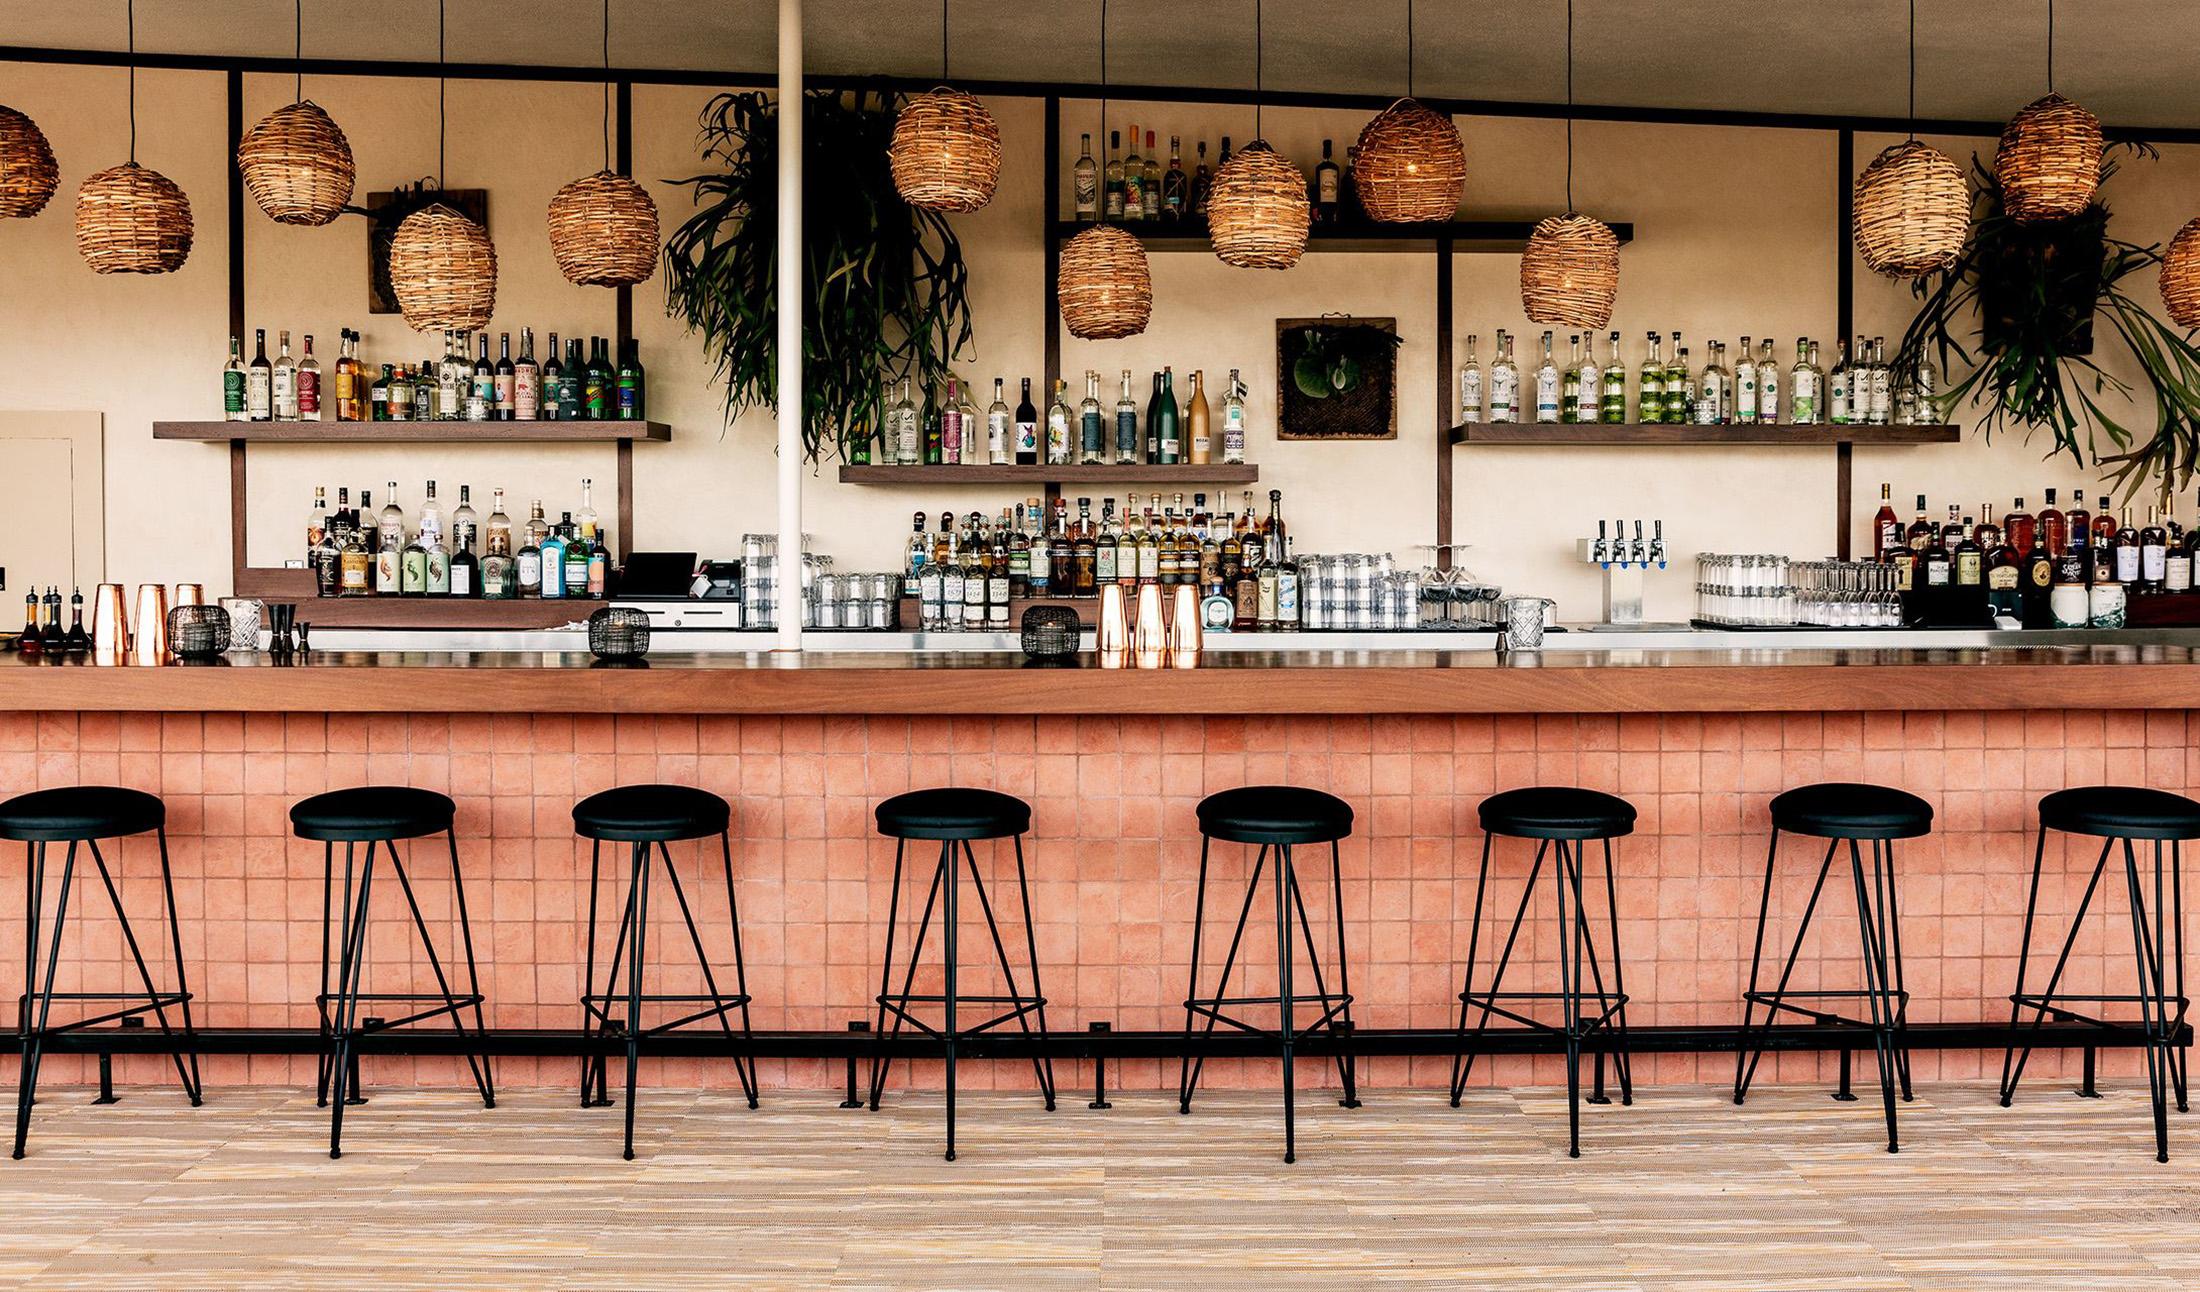 The Hotel June - Midcentury modern design hotel Los Angeles